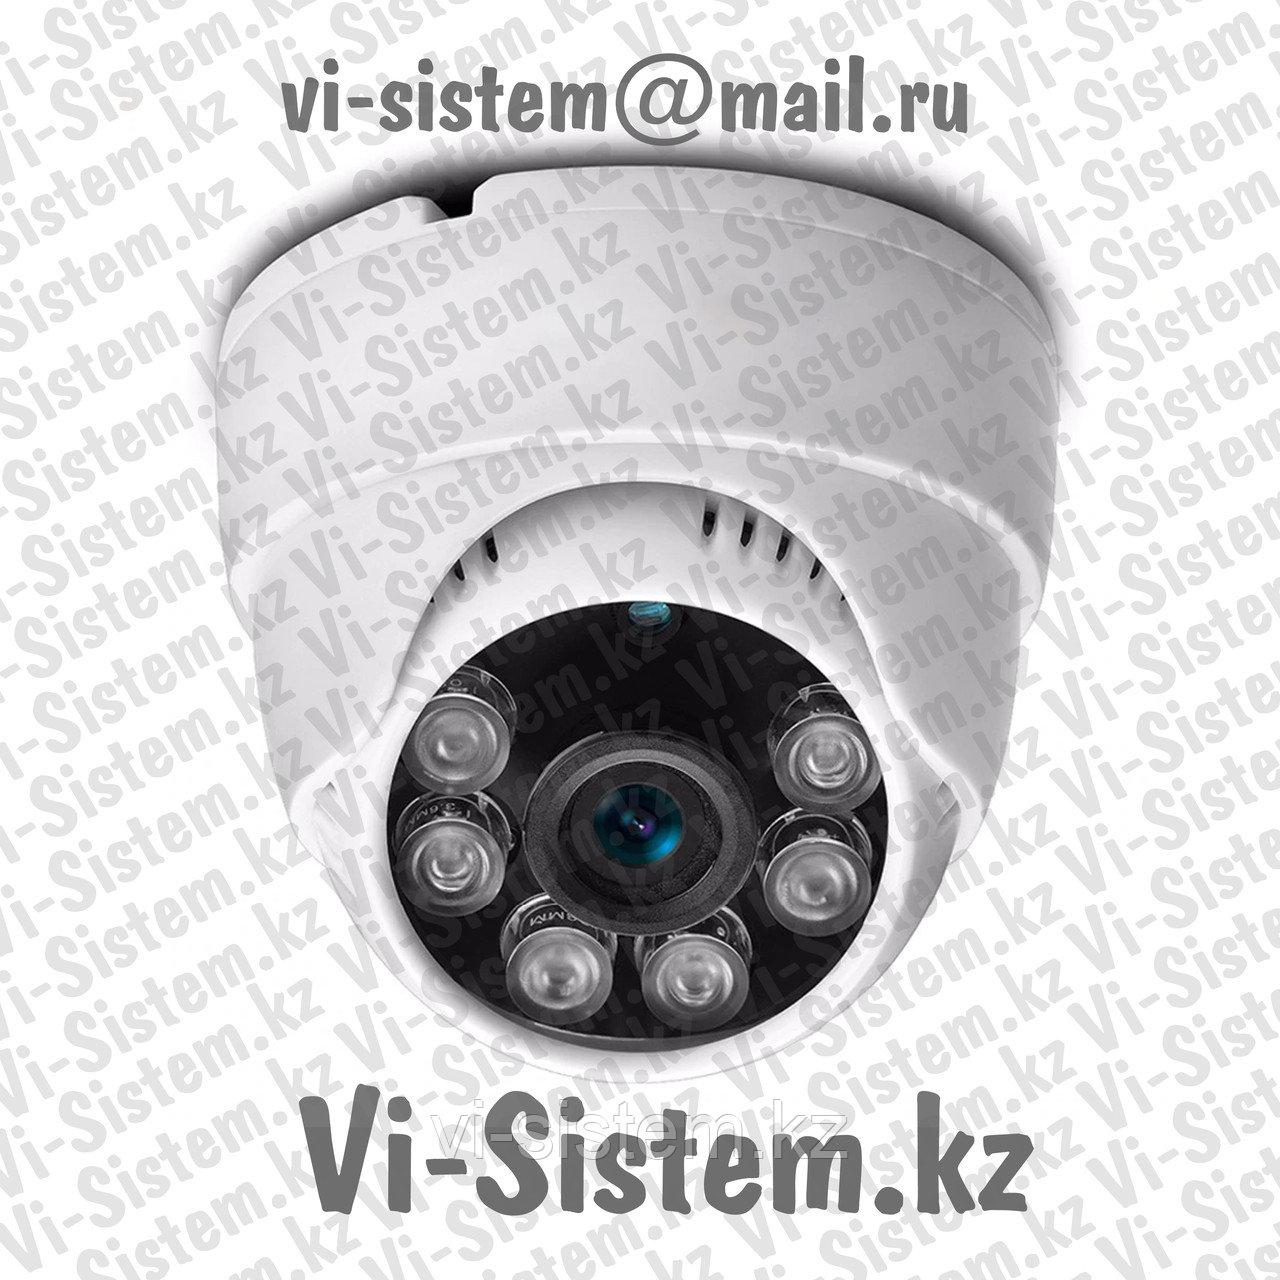 IP-Видеокамера SYNQAR 161 2MP